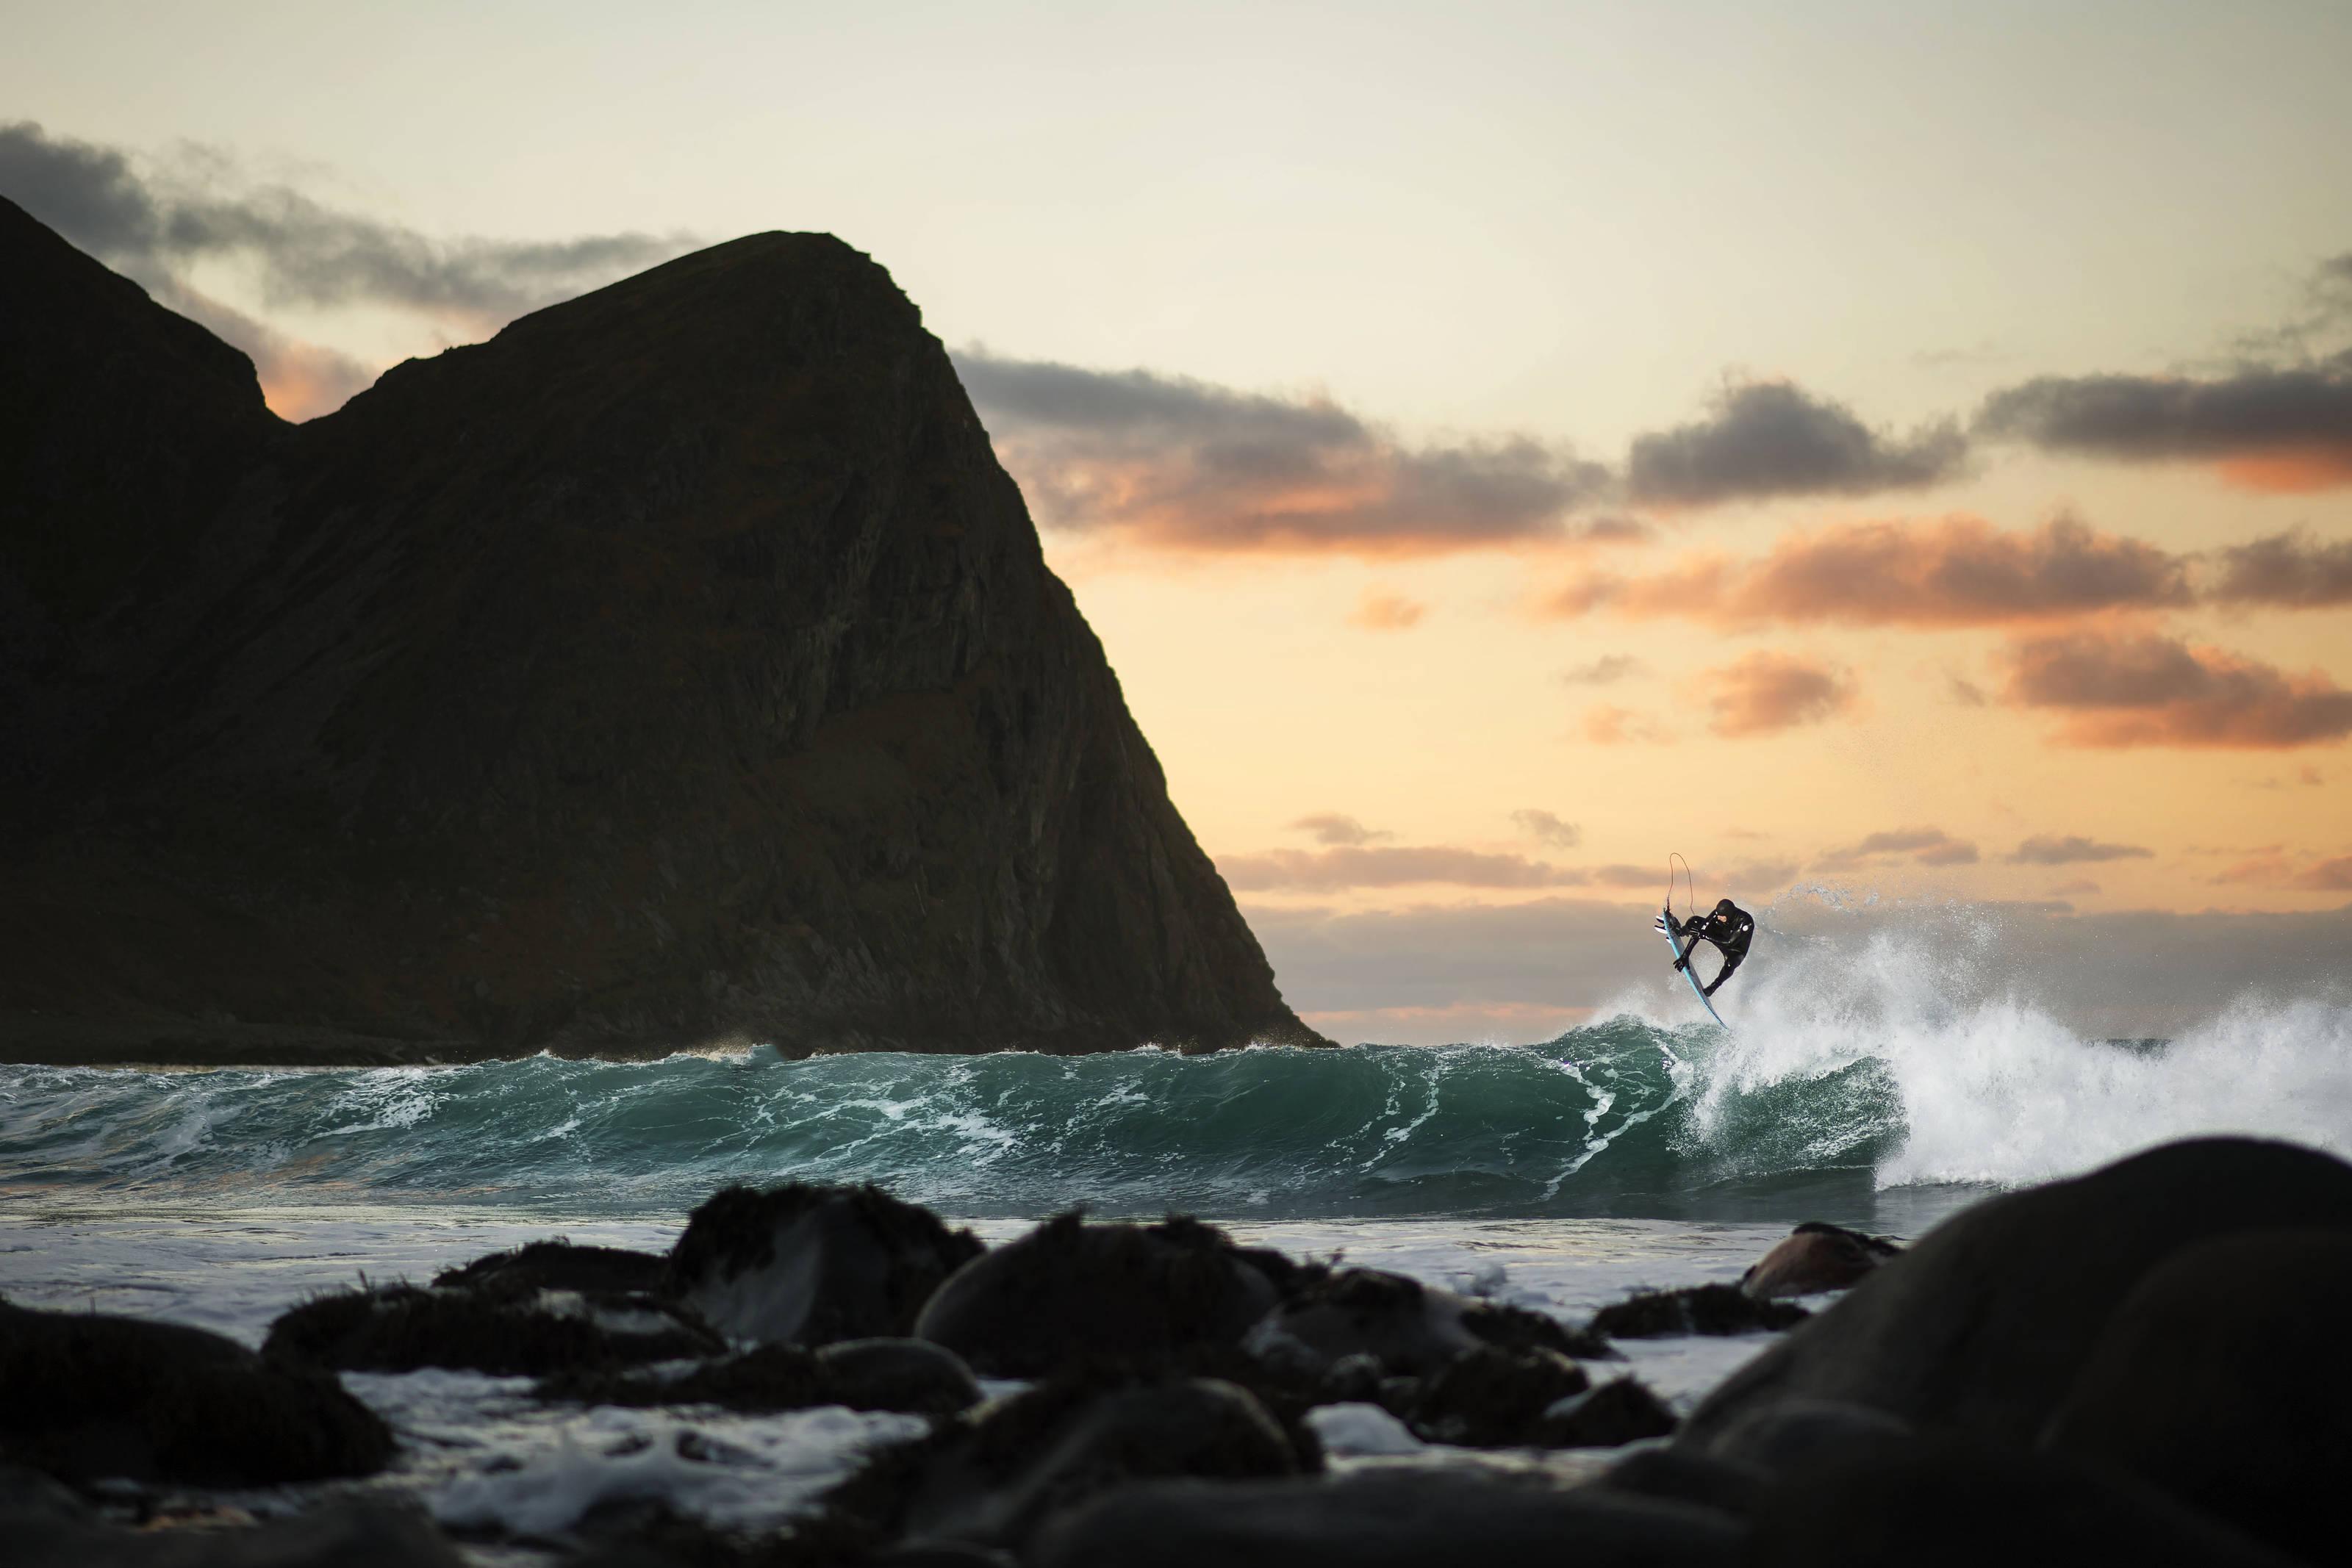 Mick Fanning surft auf den norwegischen Lofoten im November 2016. Credit: Red Bull Content Pool